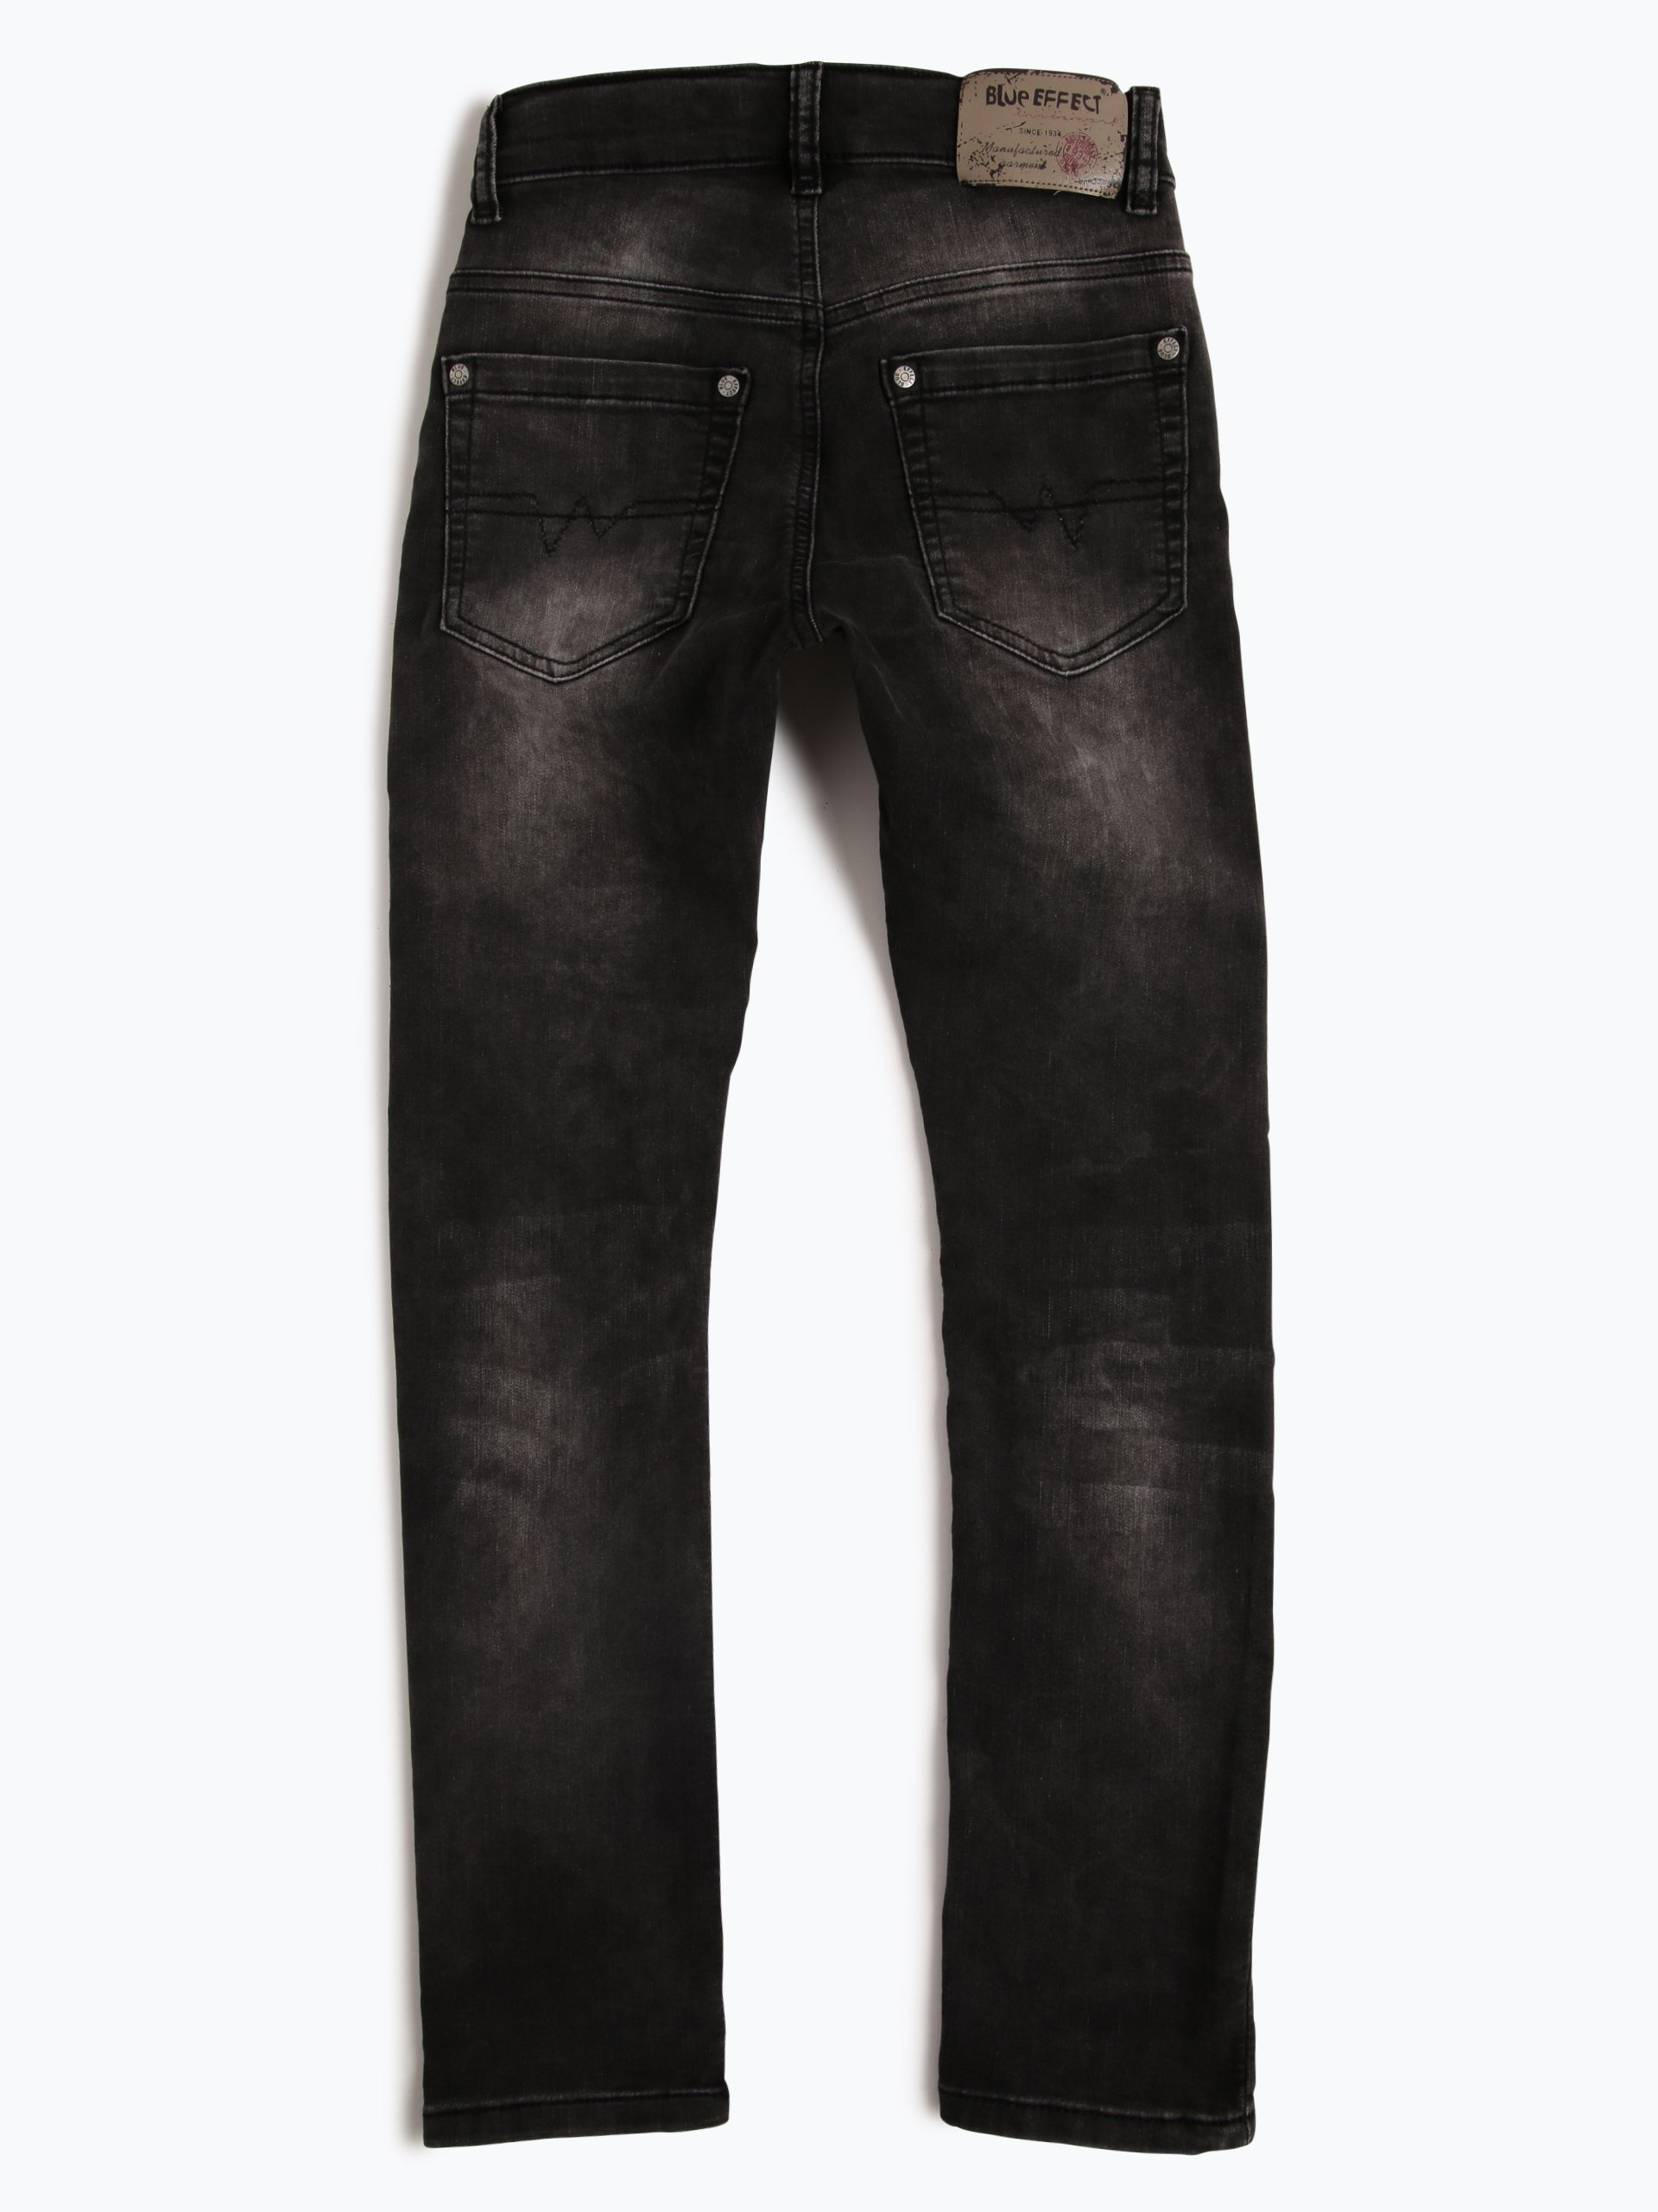 Blue Effect Jungen Jeans Skinny Fit